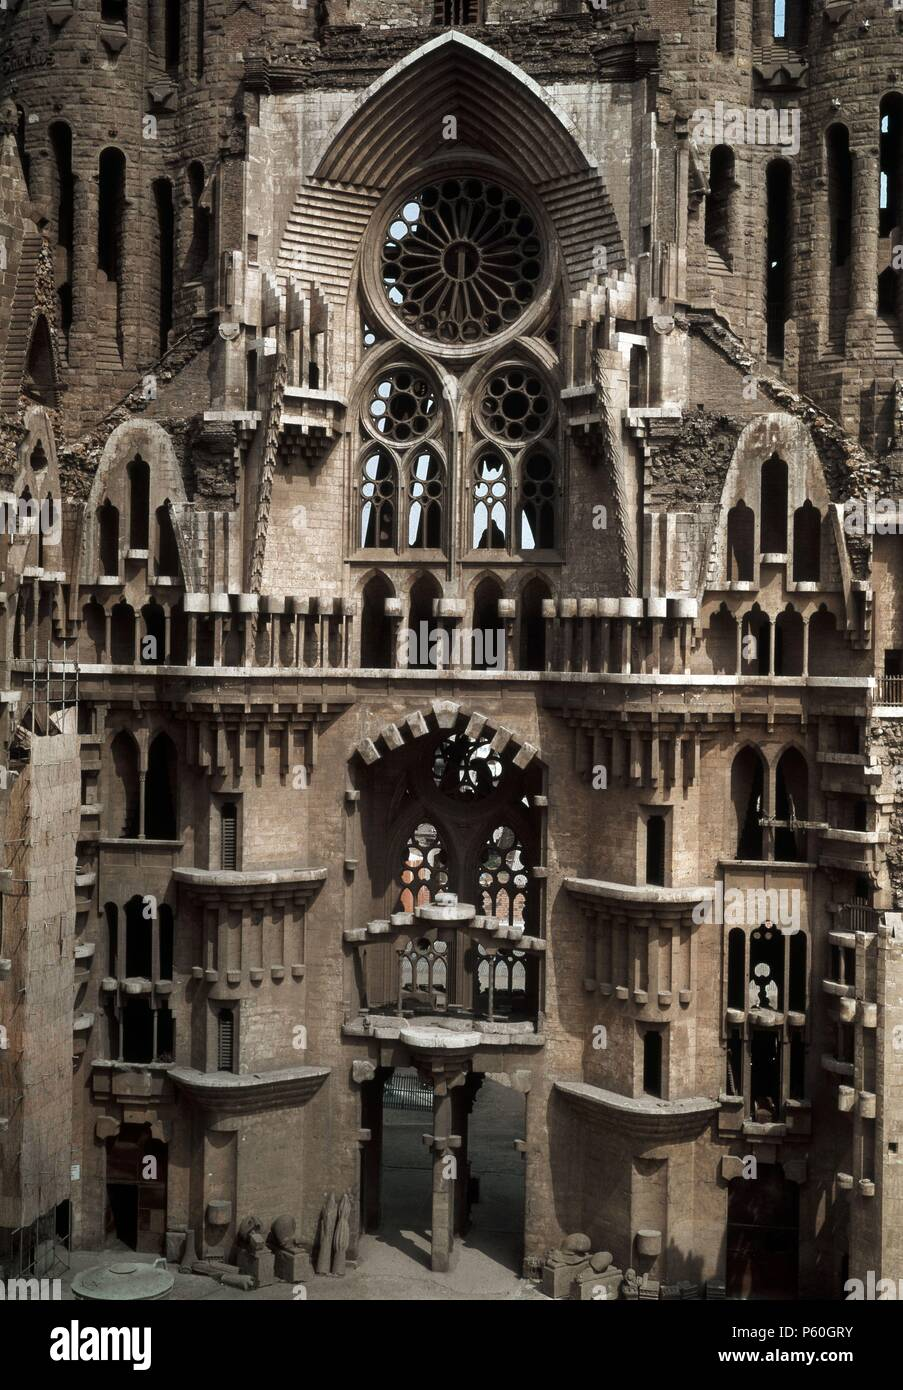 EXTERIOR. Author: Antoni Gaudí (1852-1926). Location: SAGRADA FAMILIA, SPAIN. - Stock Image